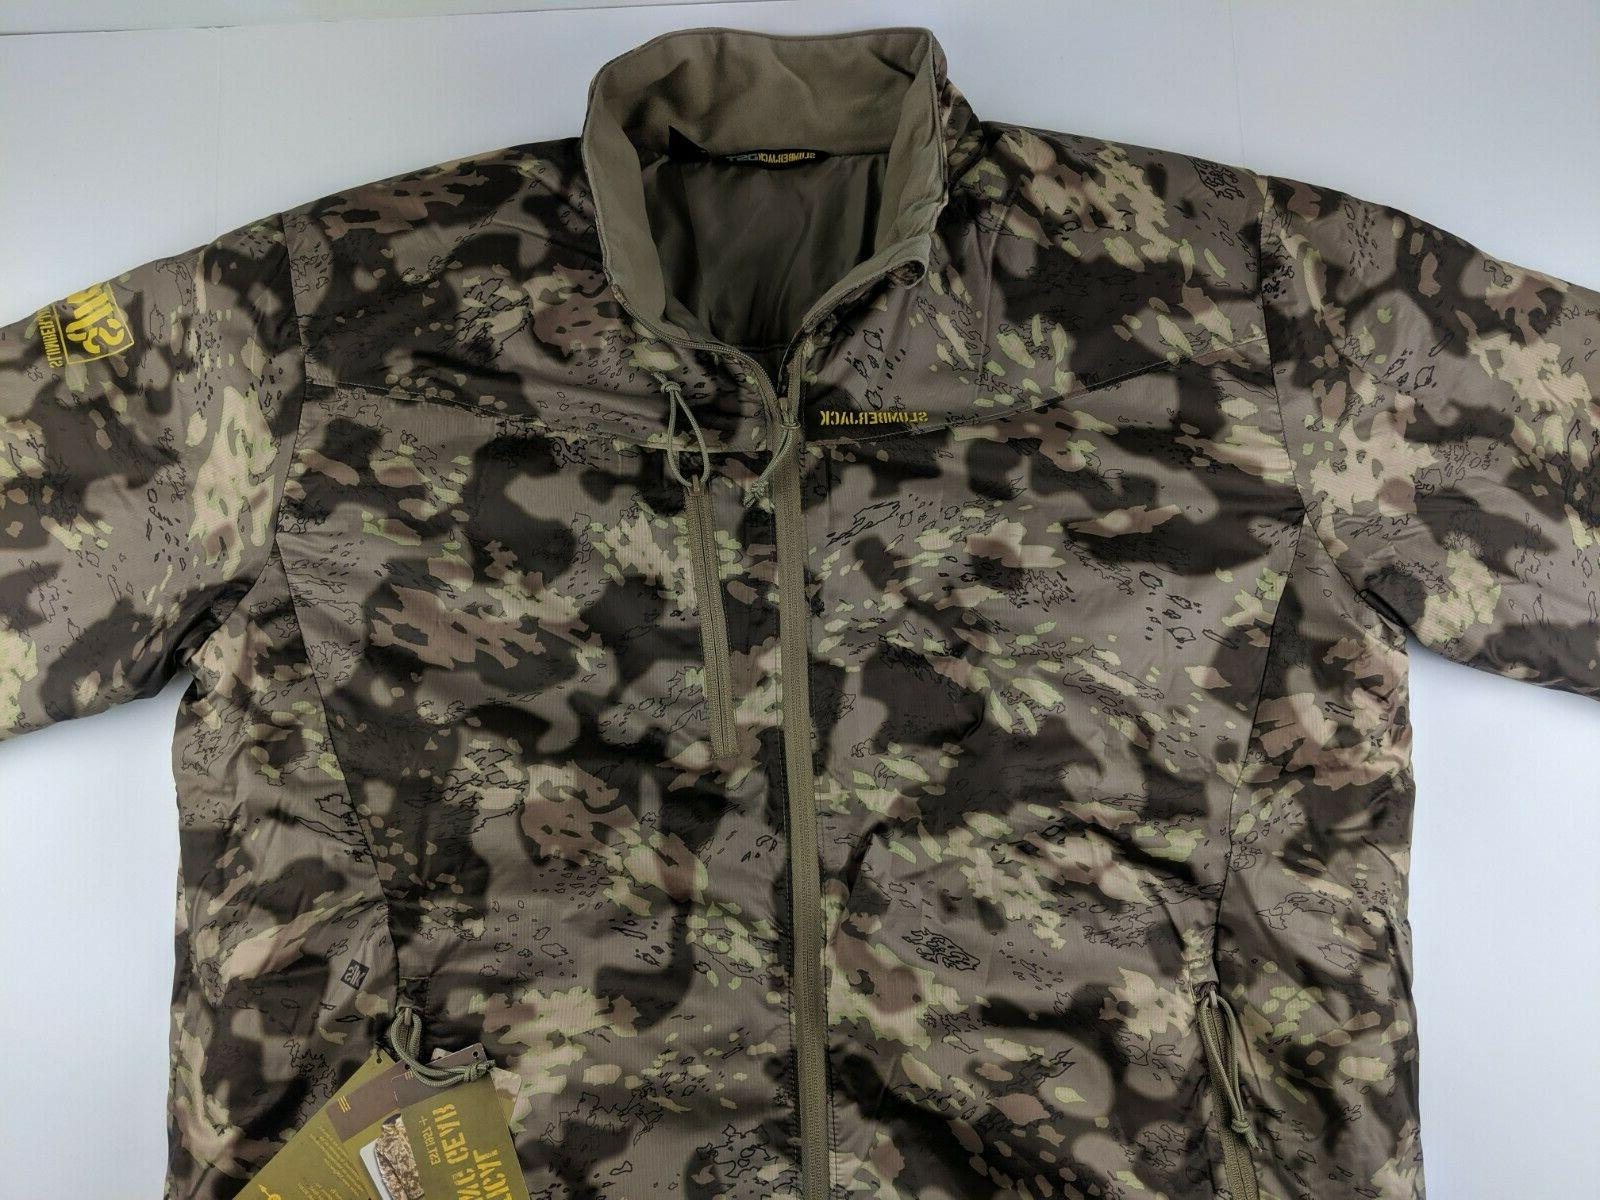 new grit jacket men xl camouflage tactical